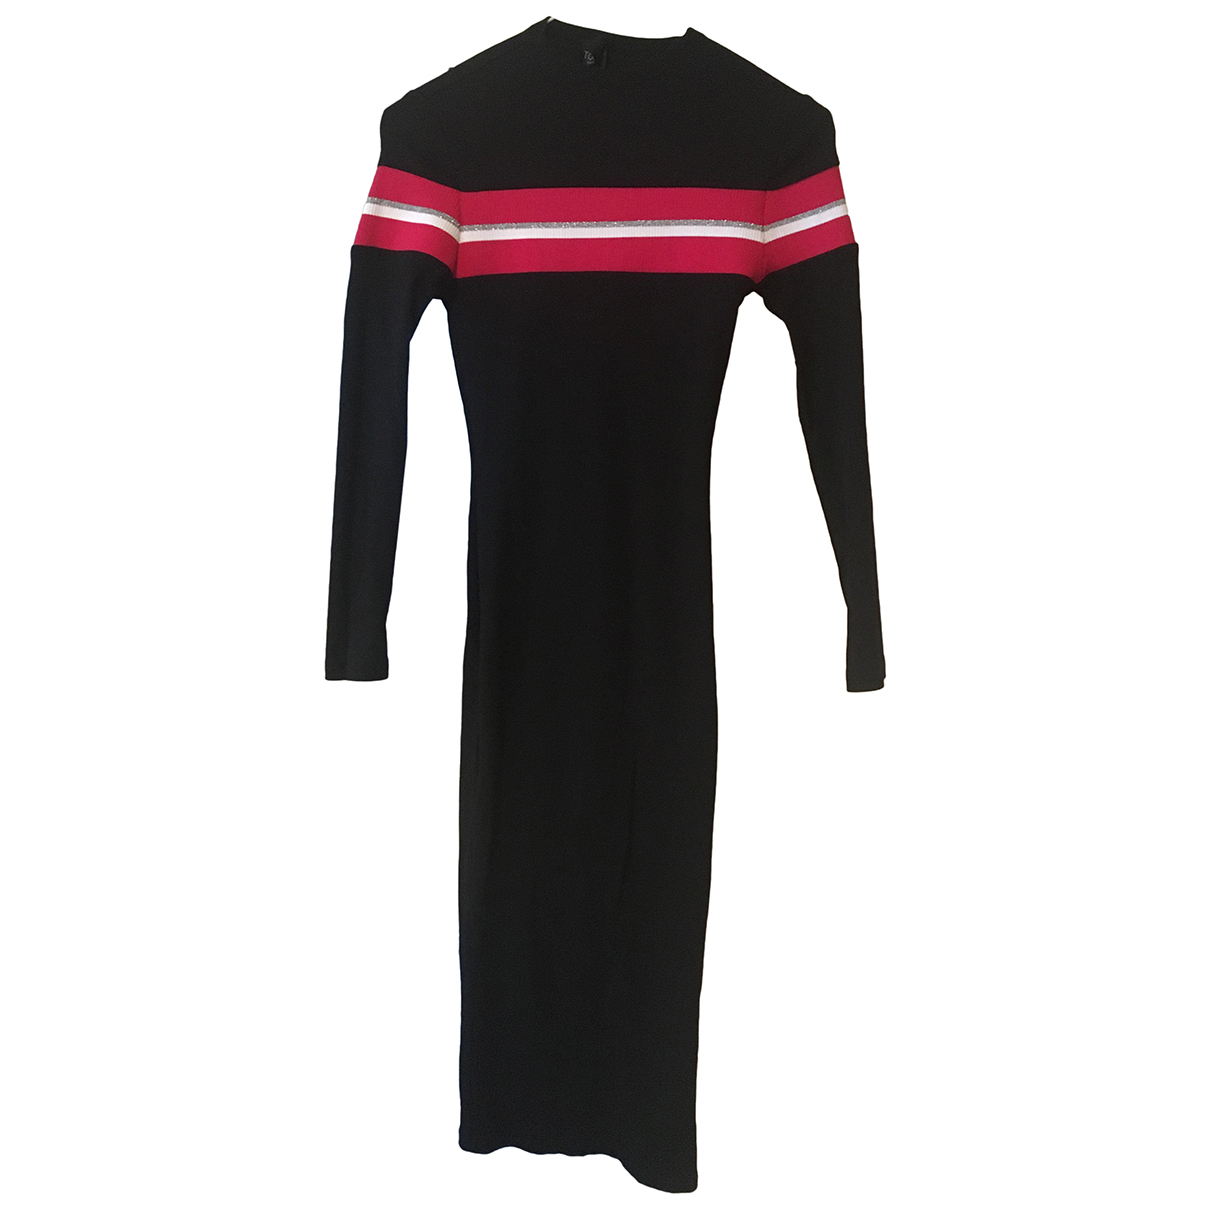 Topshop - Robe   pour femme en coton - elasthane - marine